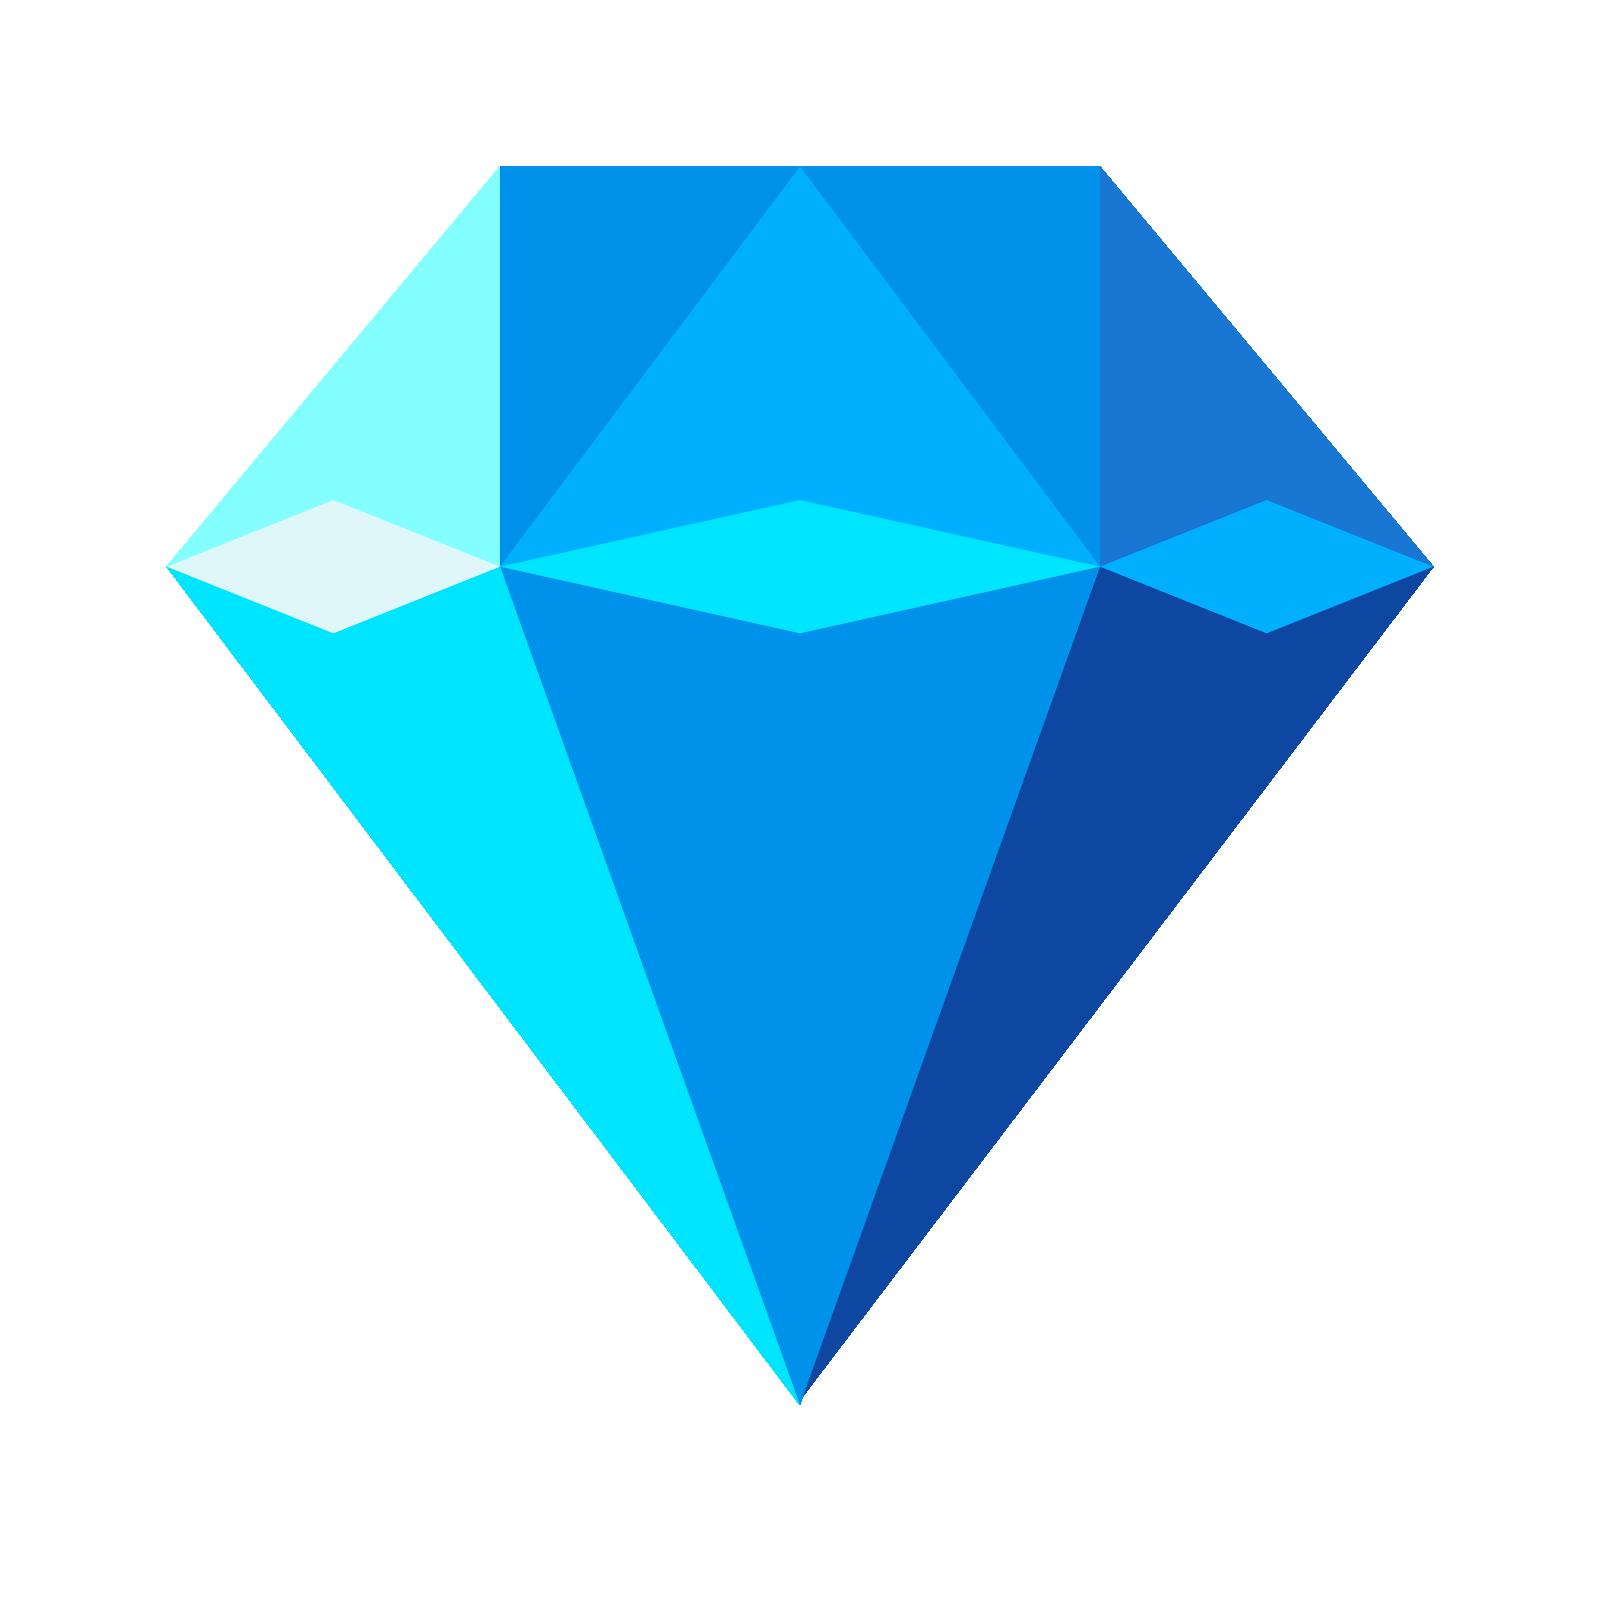 cut diamond images - Blue Diamond PNG HD